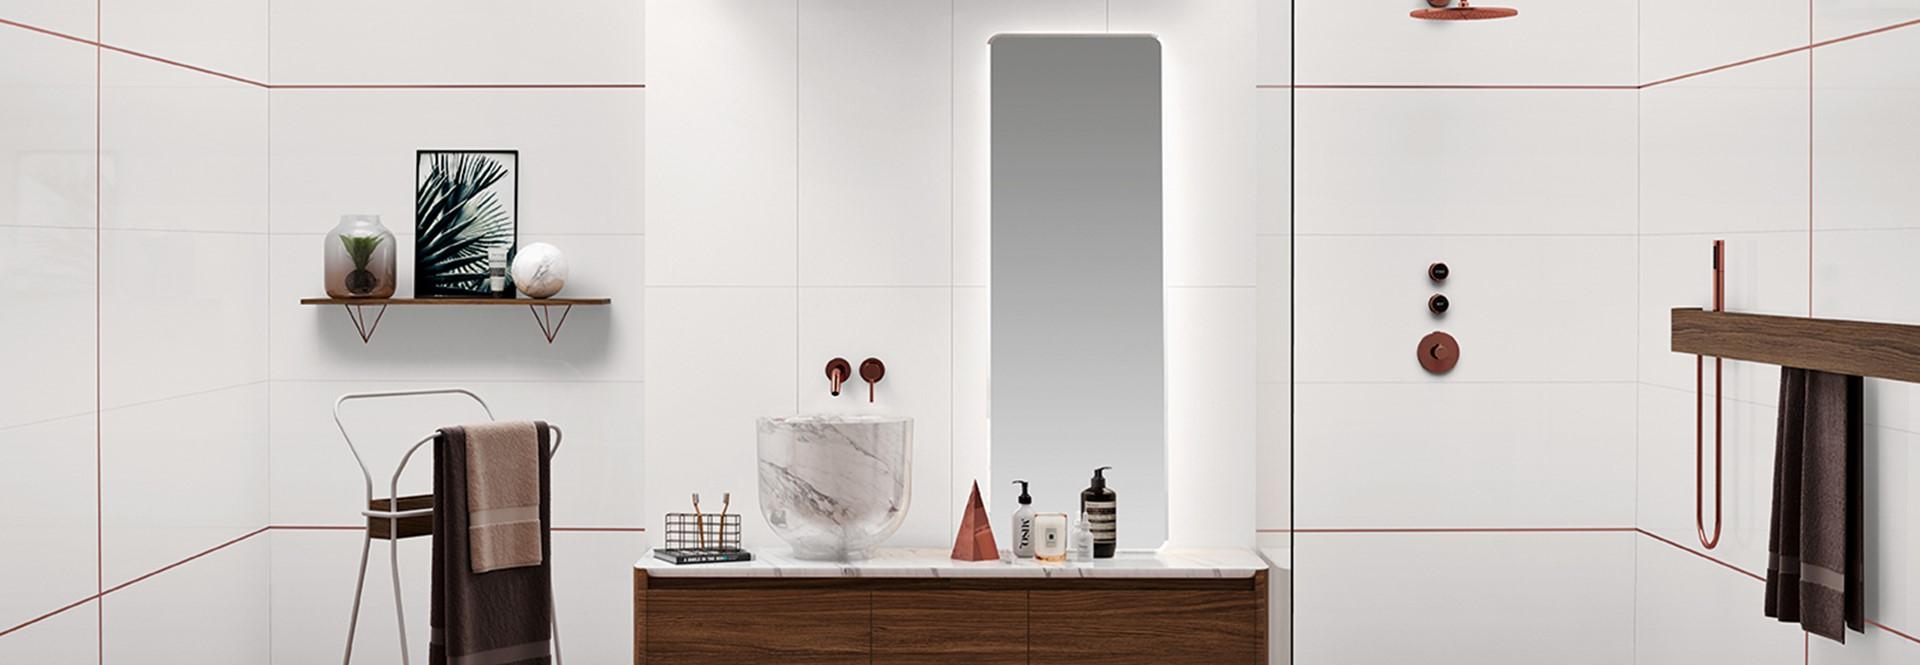 obklady-do-koupelny-kuchyne-bile-velkoformatove-love-tiles-branco-brilho-01